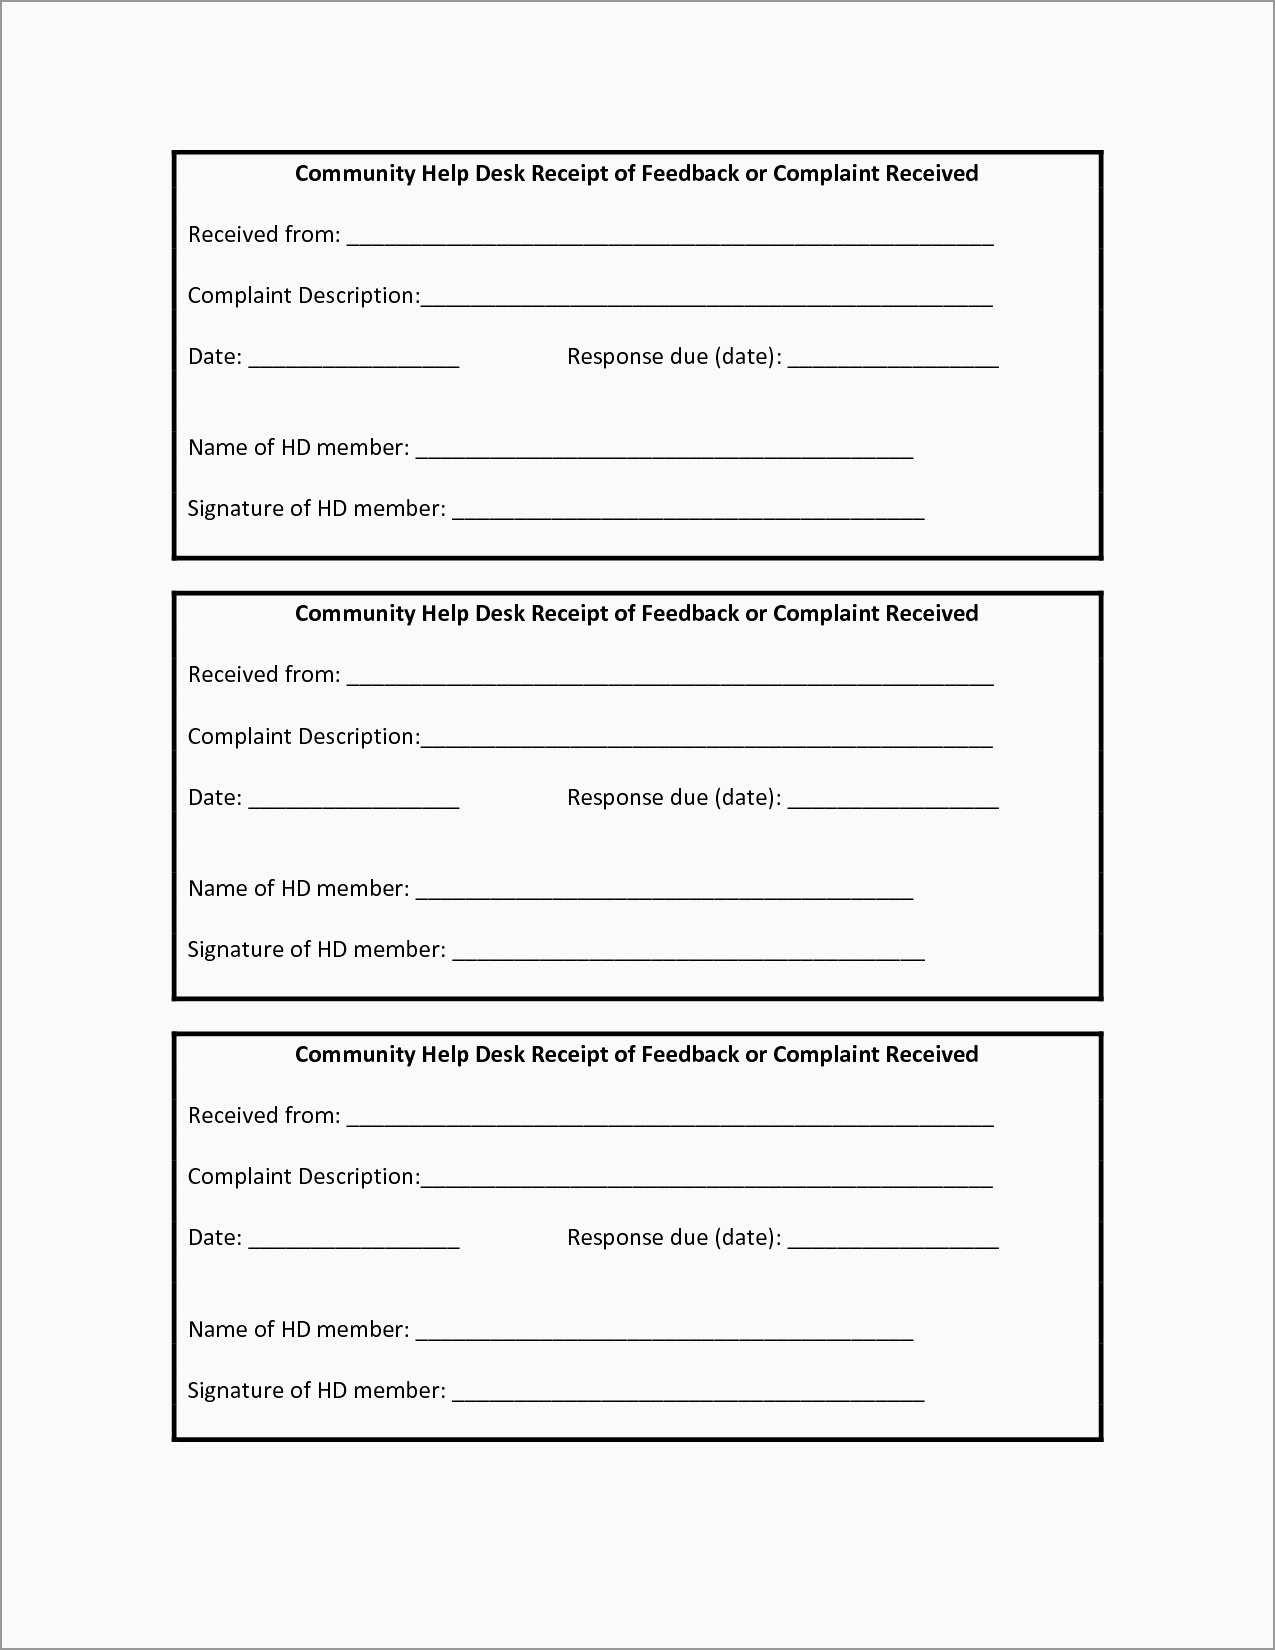 Free Printable Blank Receipt Template Good Free Printable Cash - Free Printable Blank Receipt Form